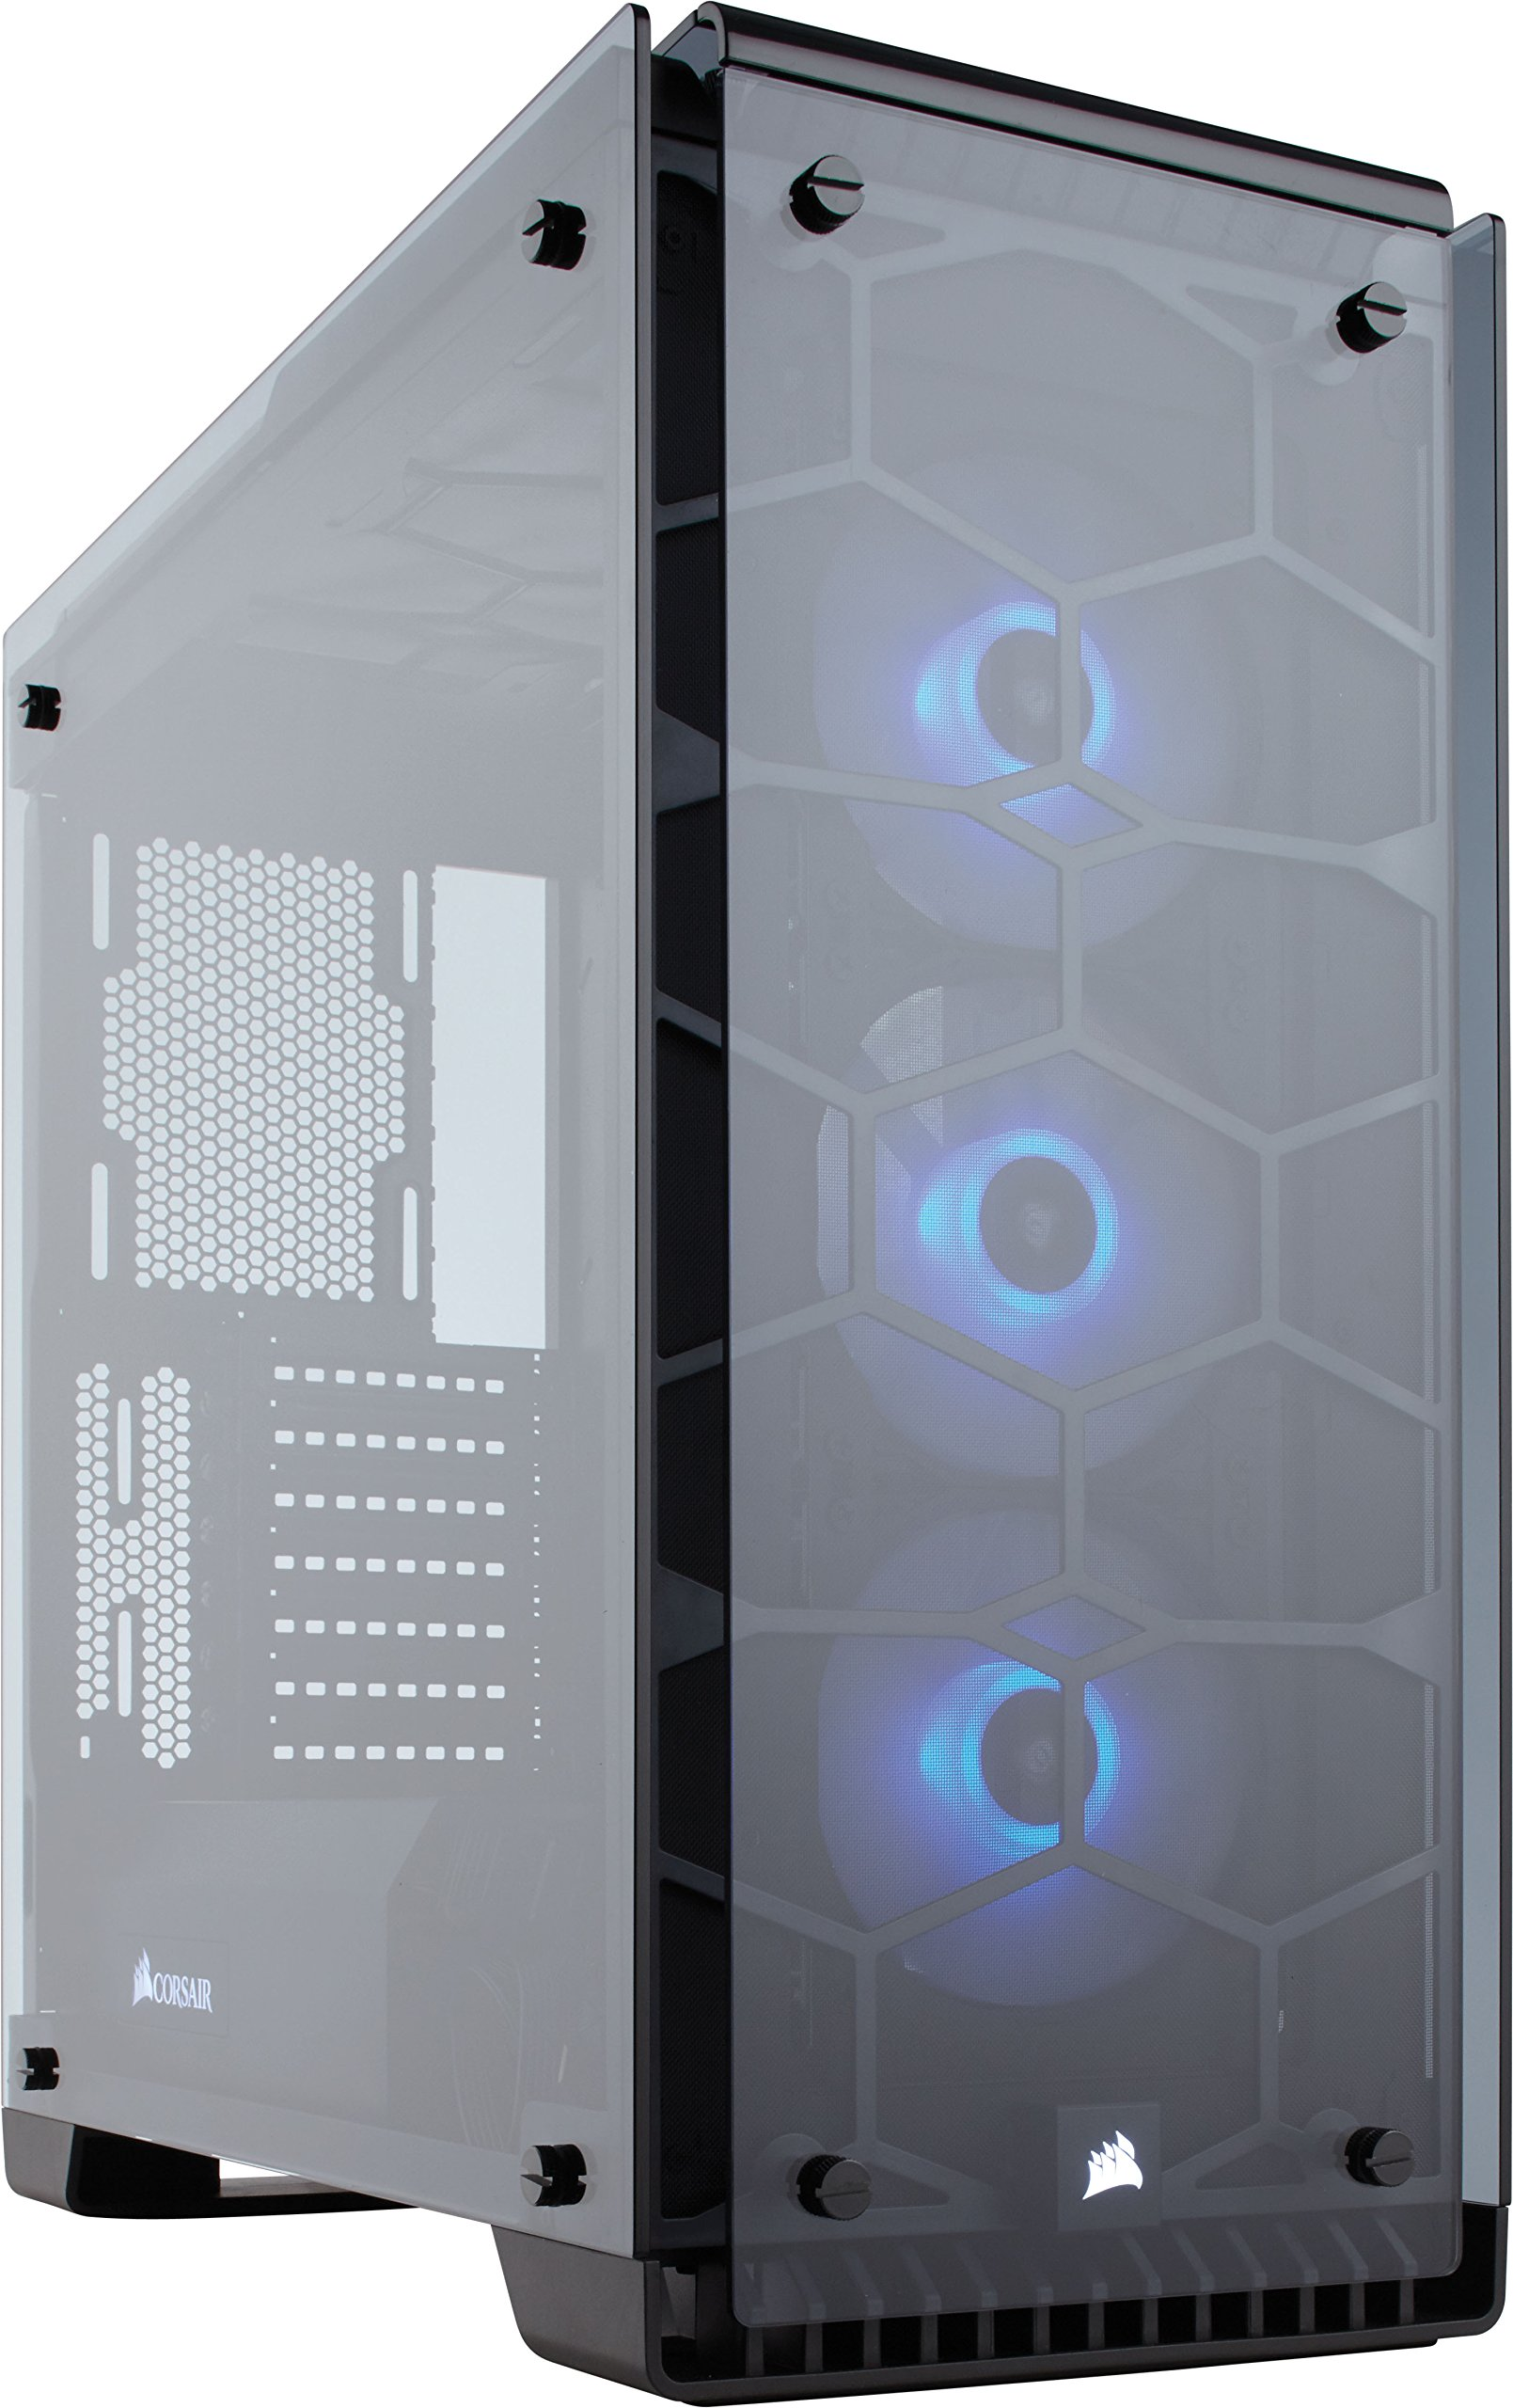 Corsair Crystal Series 570X RGB - Tempered Glass, Premium ATX Mid-Tower Case Cases CC-9011098-WW